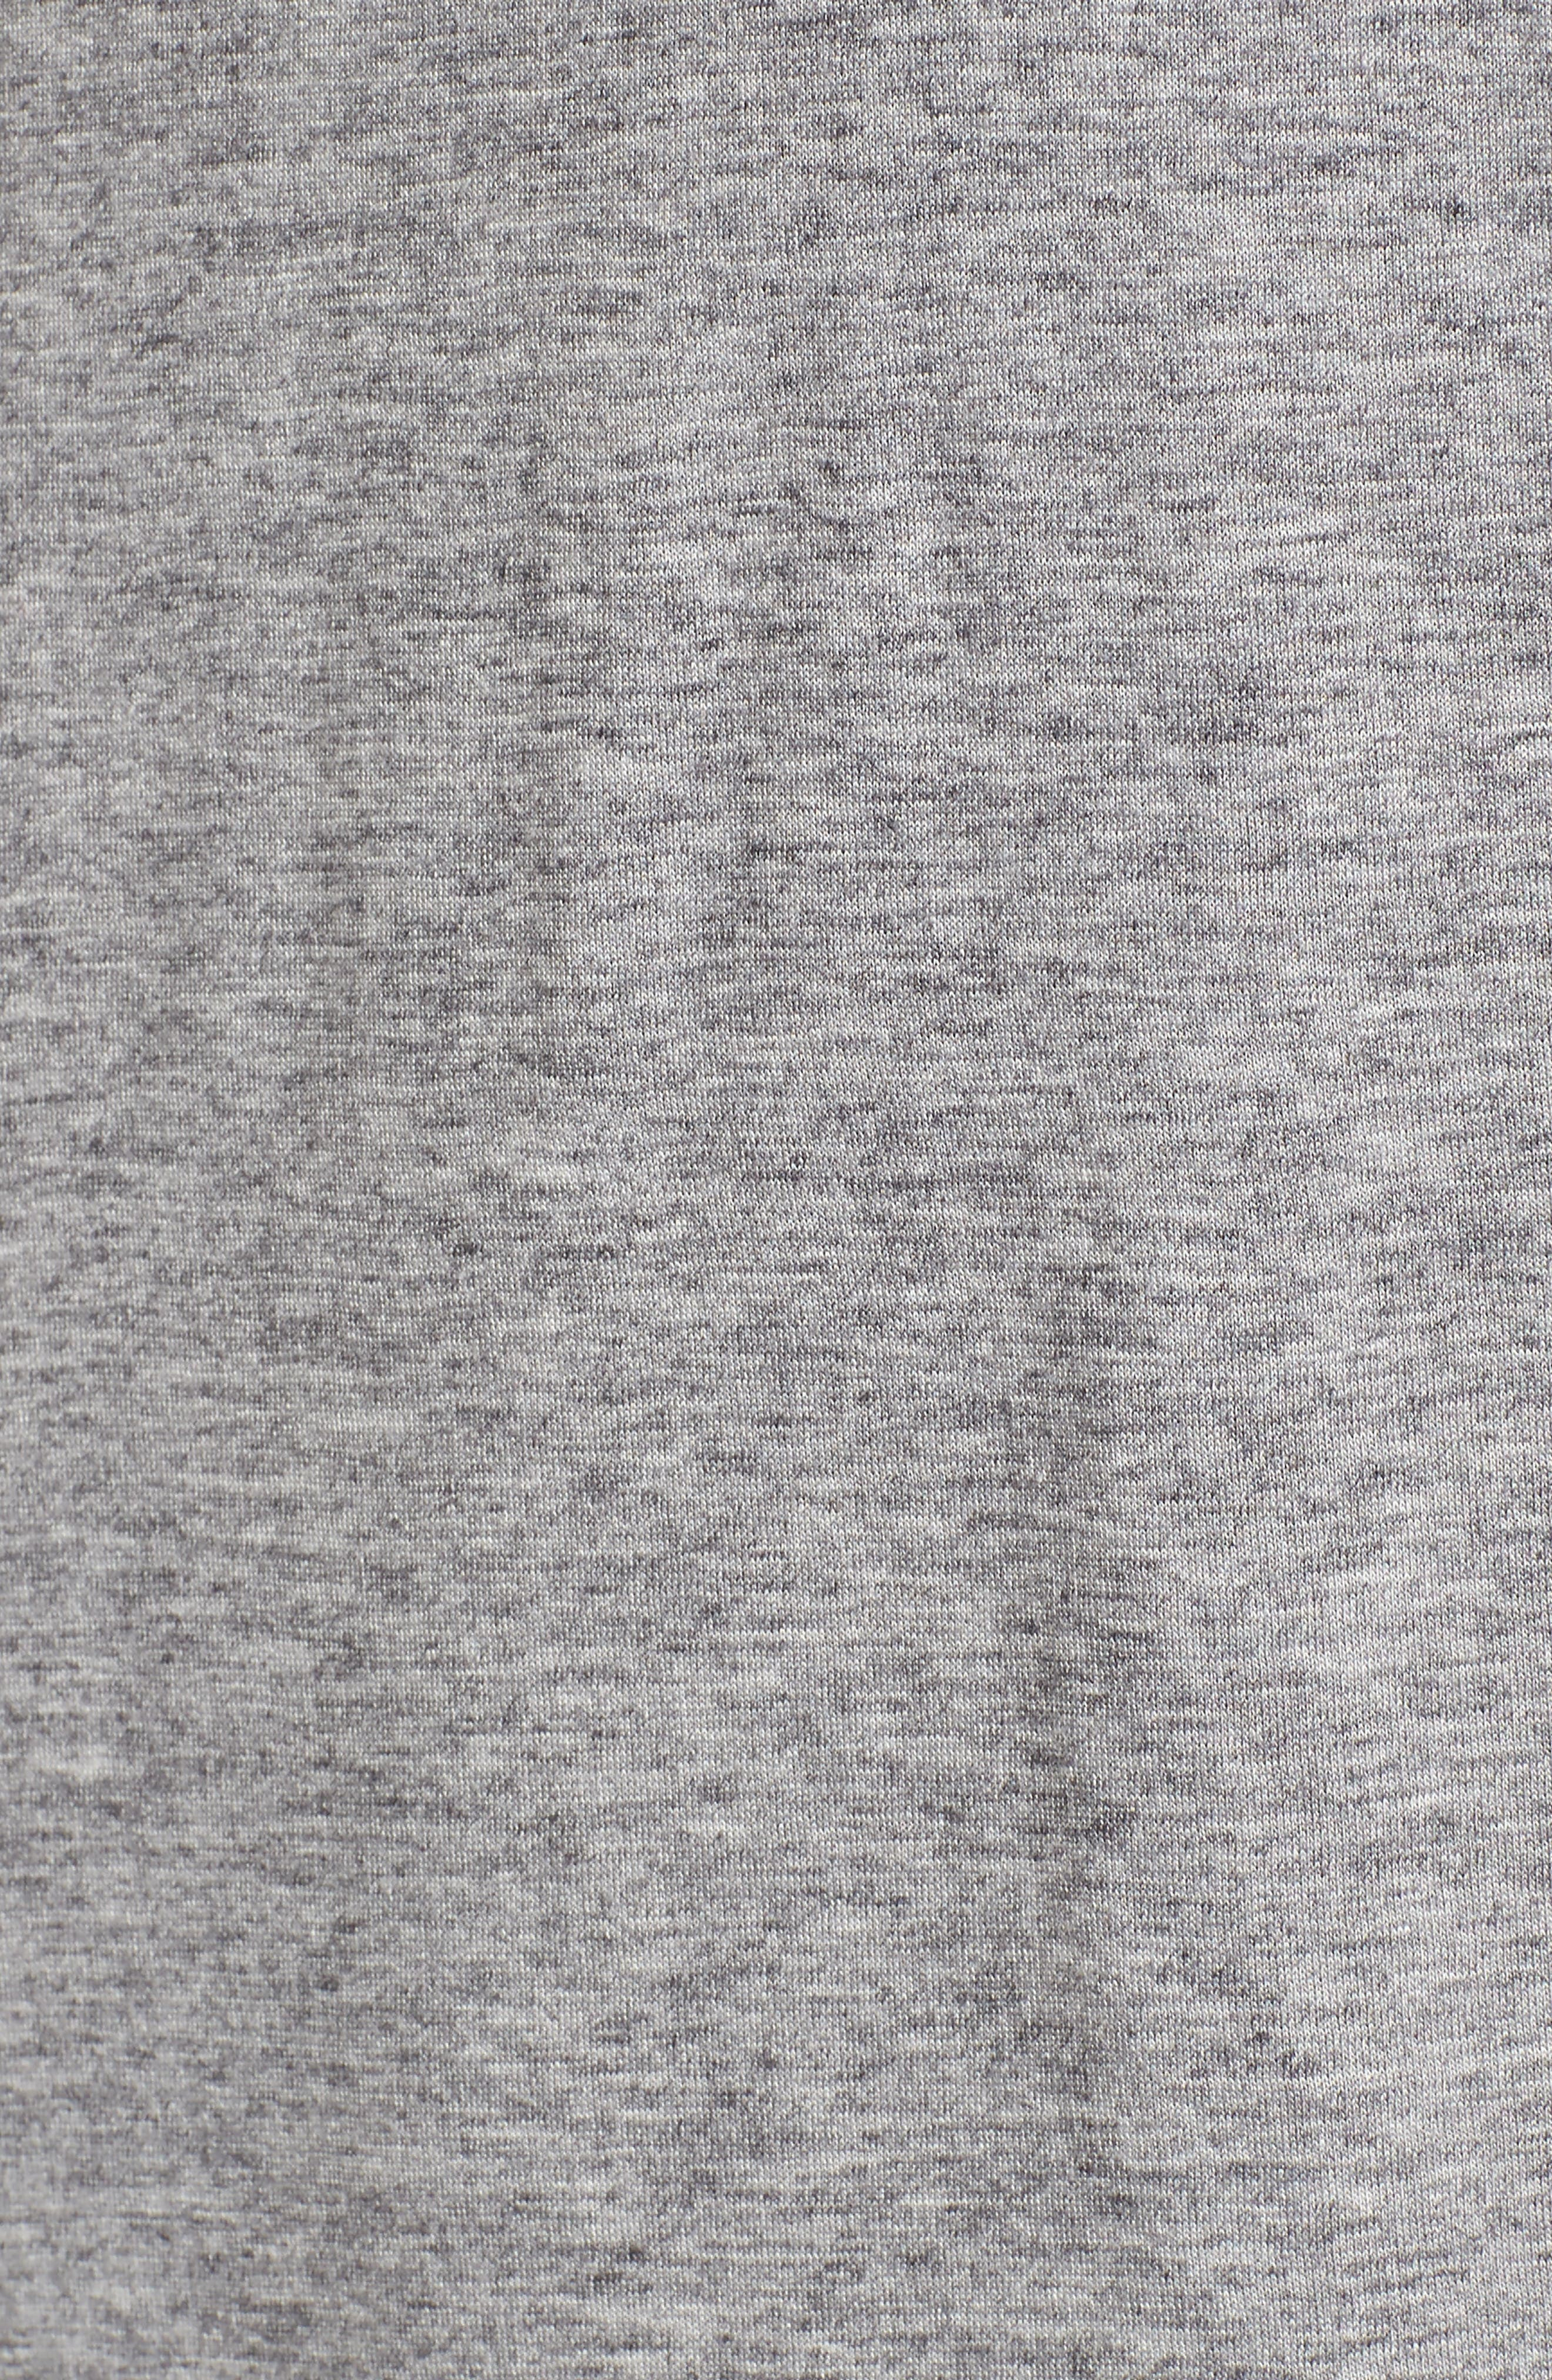 Lightweight Turtleneck Sweater,                             Alternate thumbnail 5, color,                             030